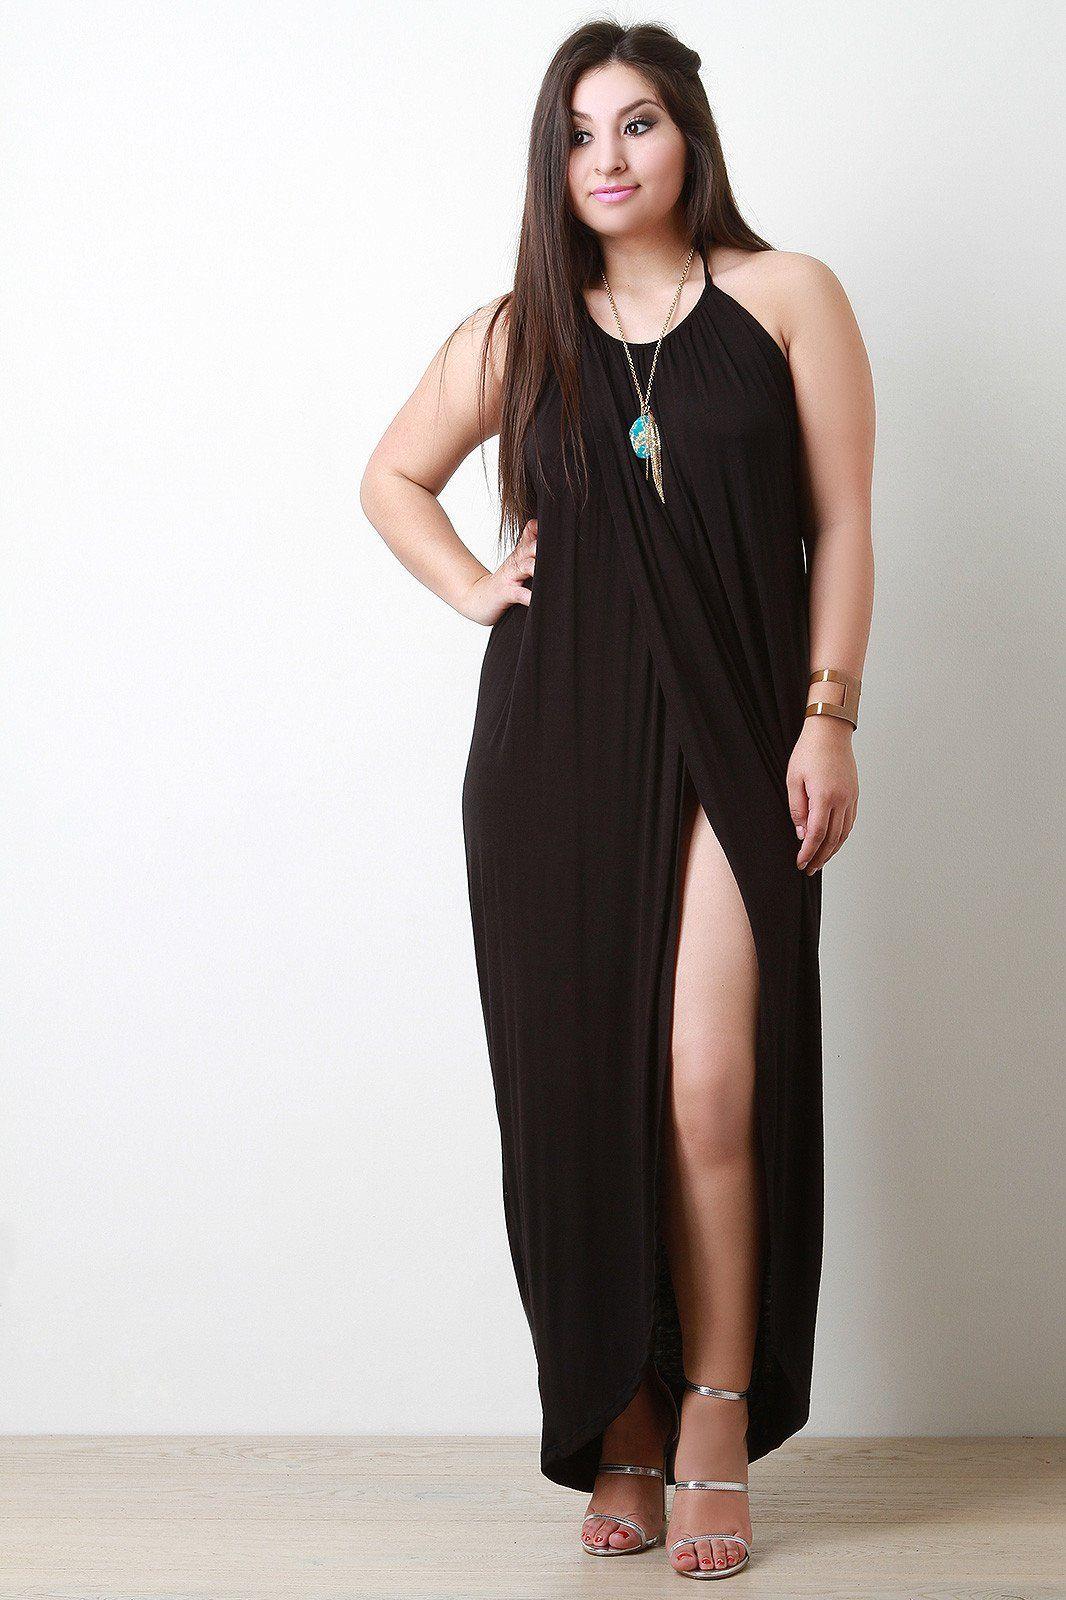 Halter front slit maxi dress beautiful woman pinterest hemline